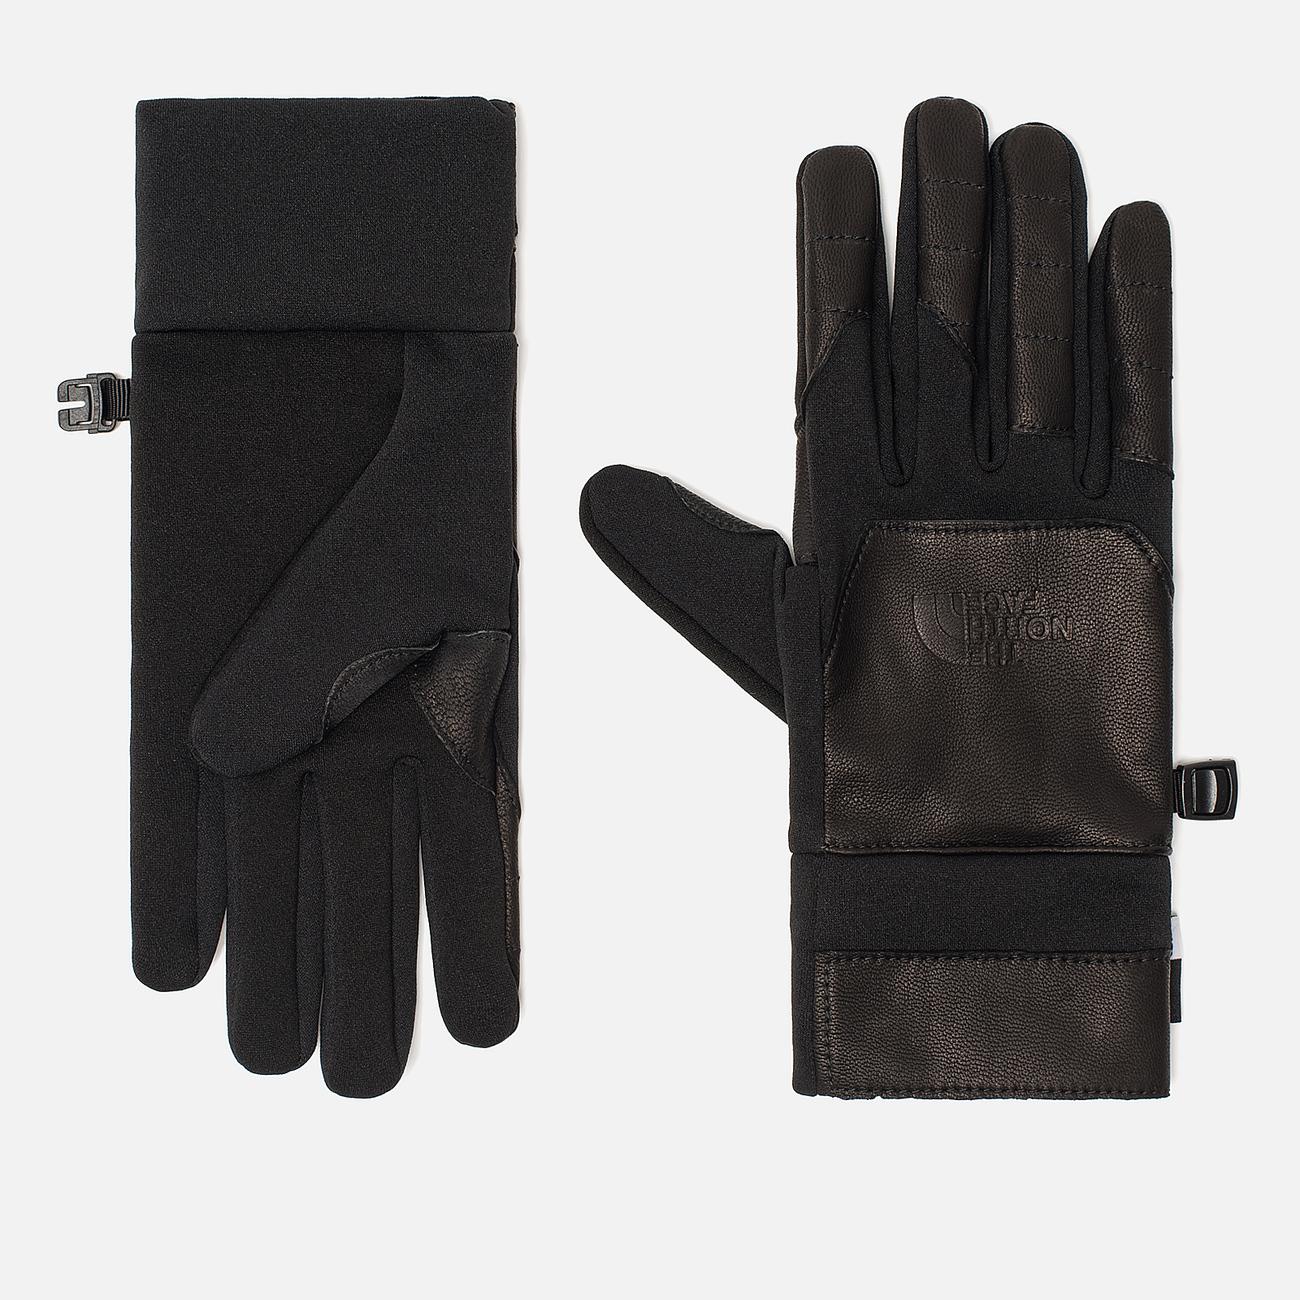 Перчатки The North Face Etip Leather TNF Black